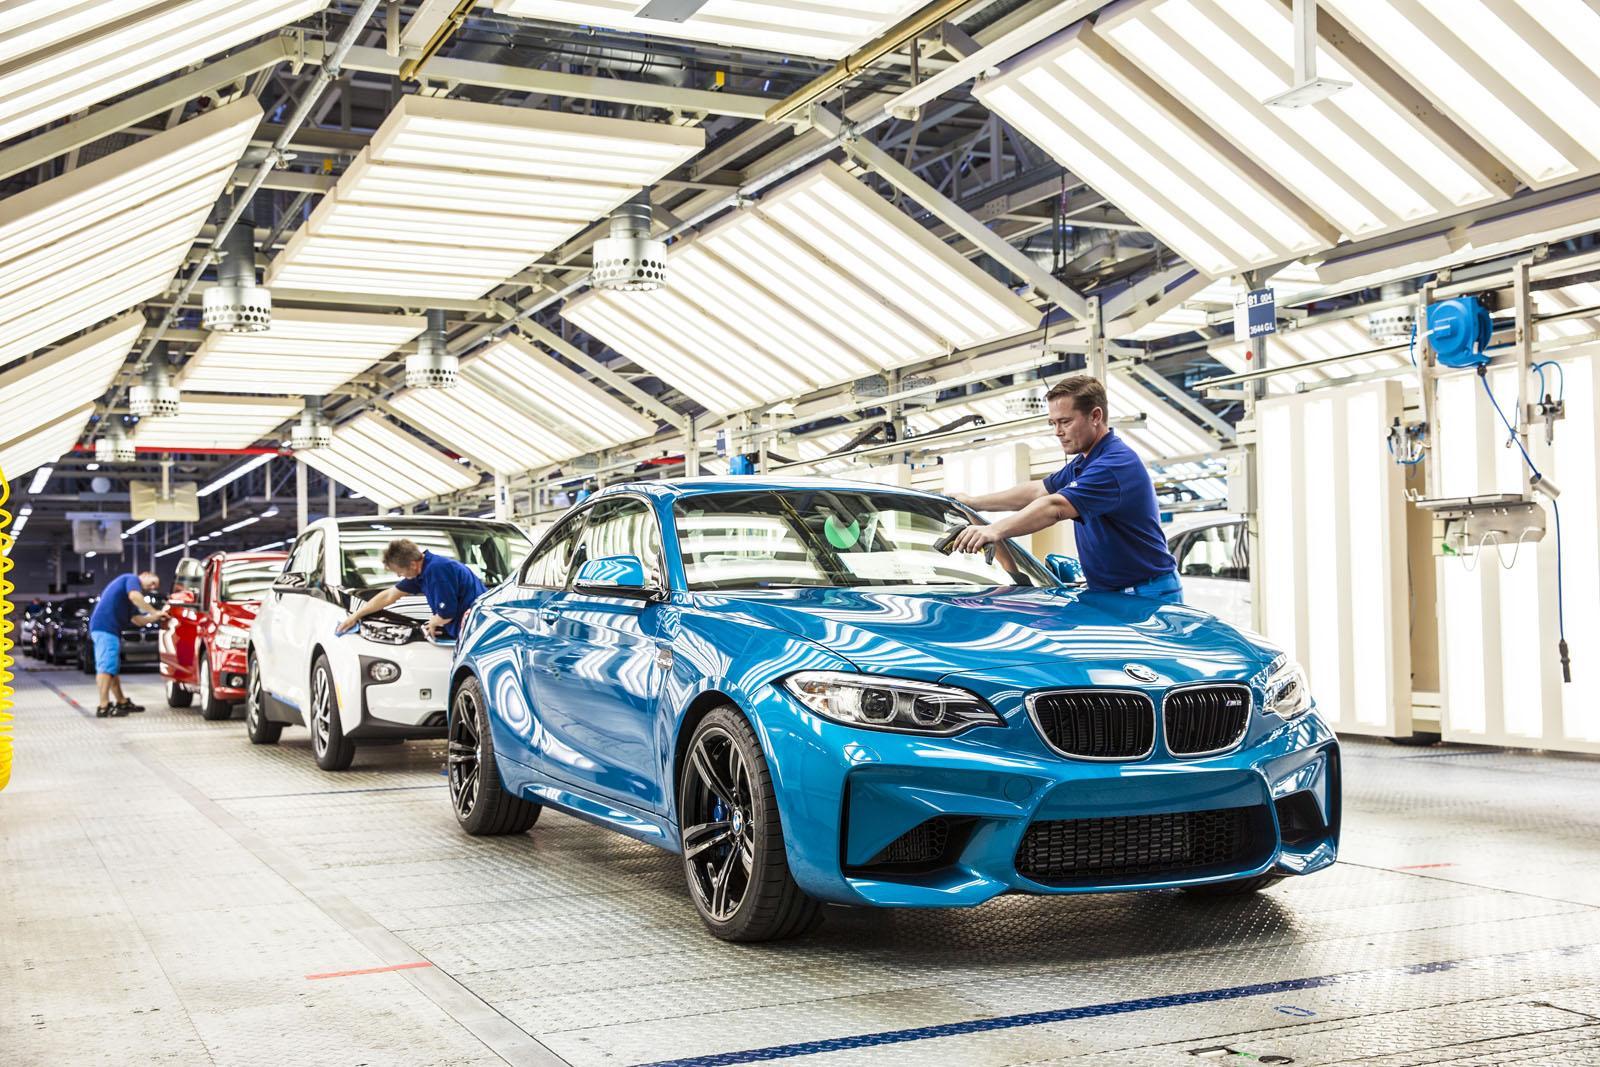 BMW M2 production factory